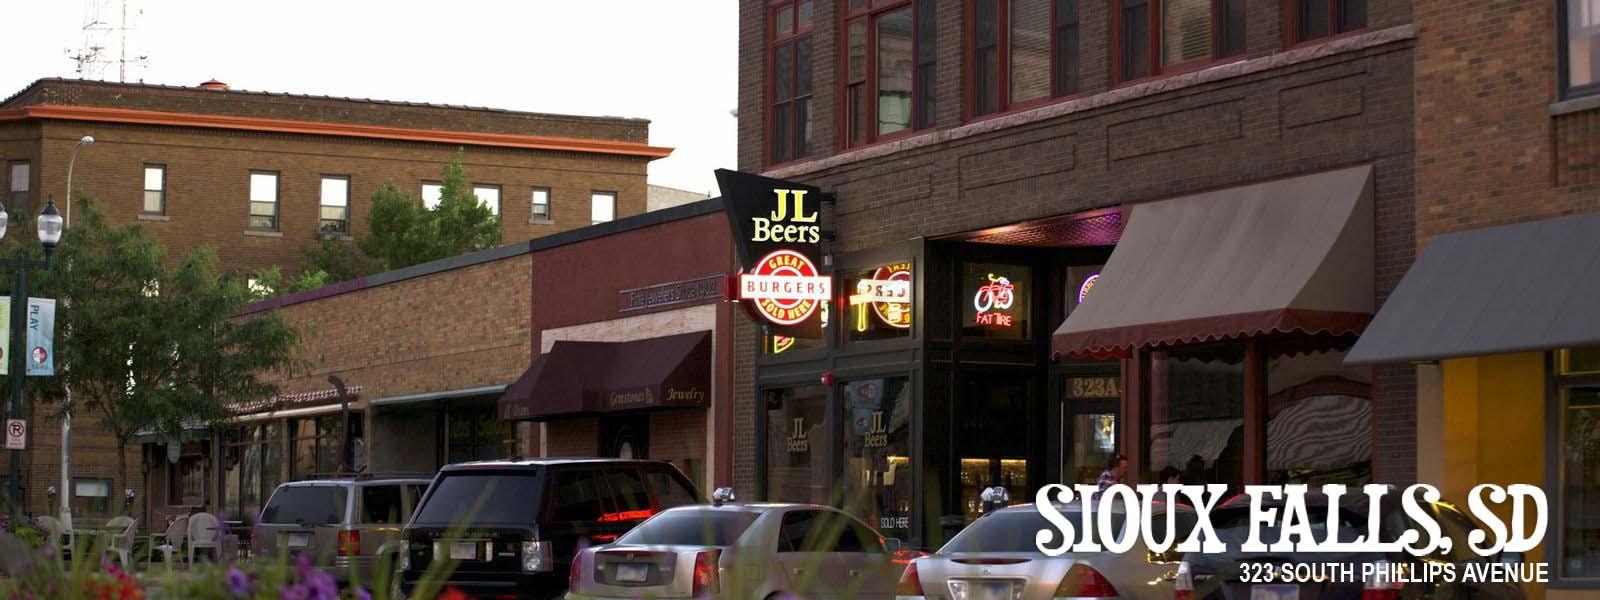 JL Beers - Great Burgers Sold Here